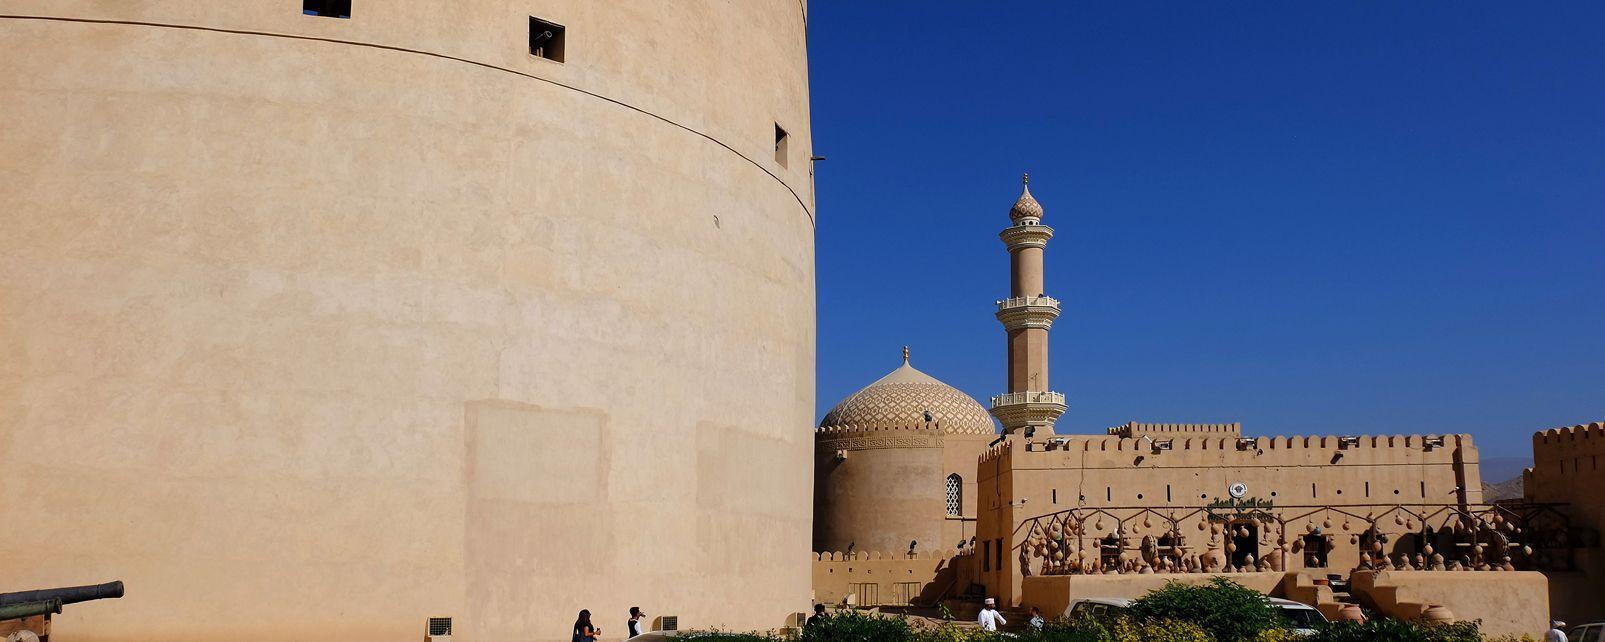 Les monuments, moyen-orient, sultanat, oman, nizwa, fort, fortification